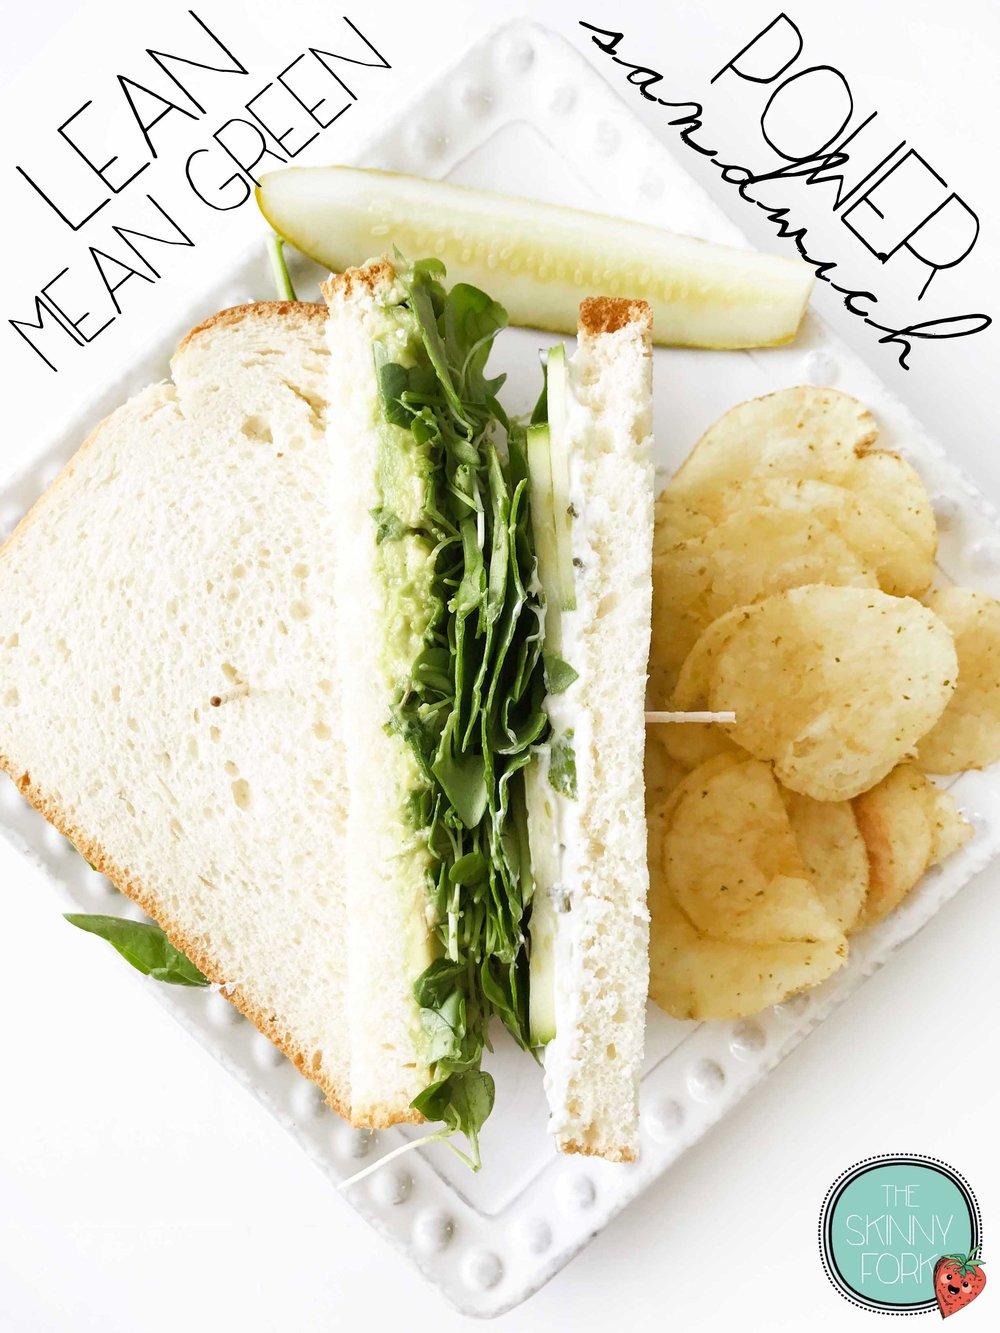 lean-mean-green-sandwich-pin.jpg